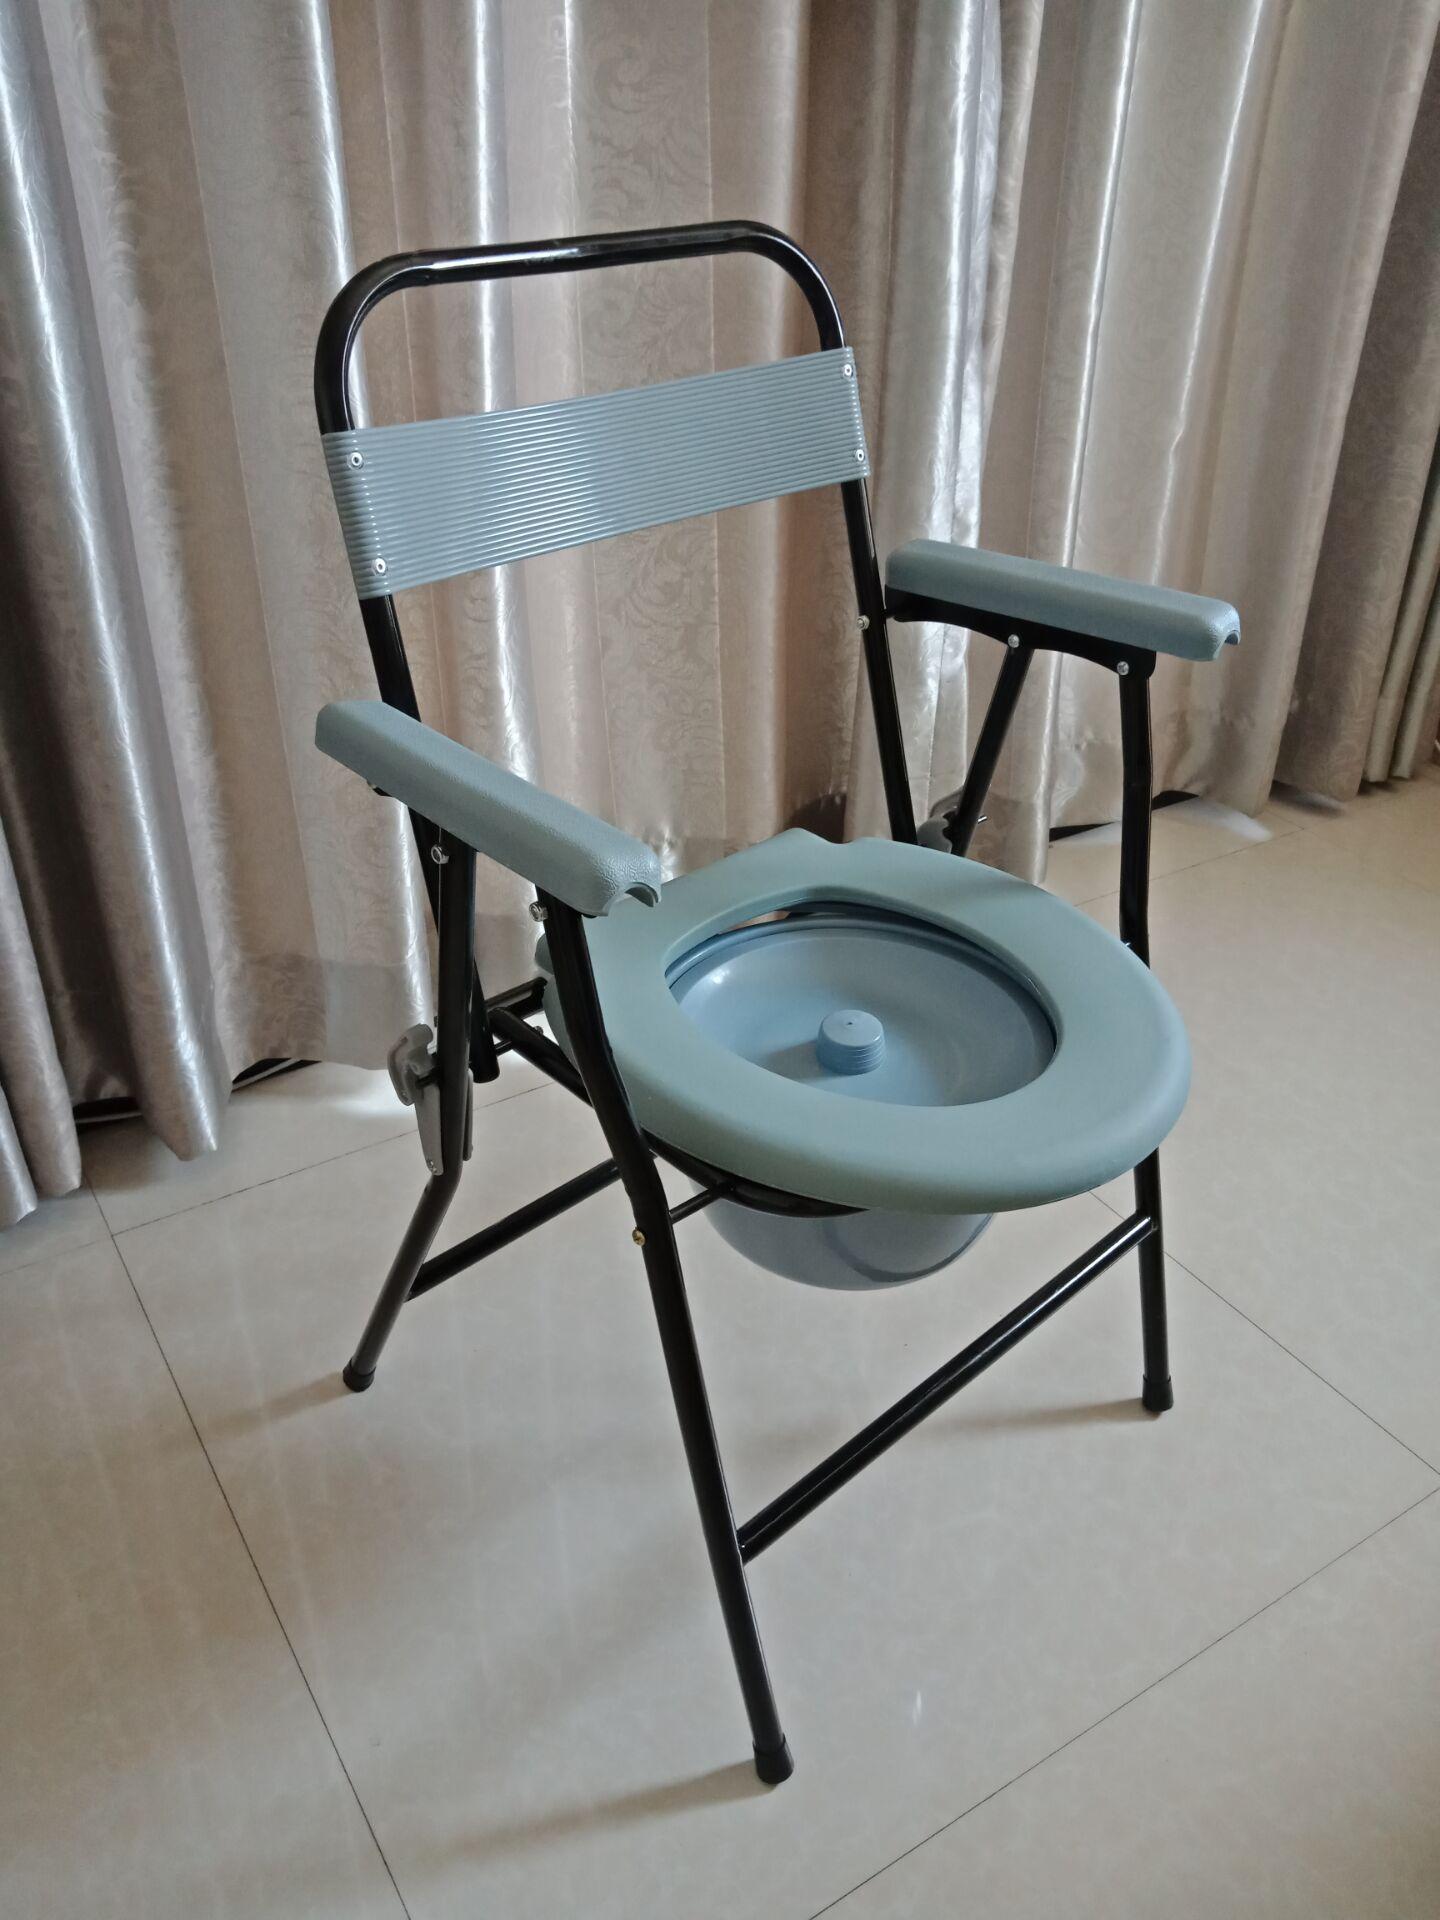 Old Man Toilet Chair Bathroom Toilet Seat Elderly,Pregnant